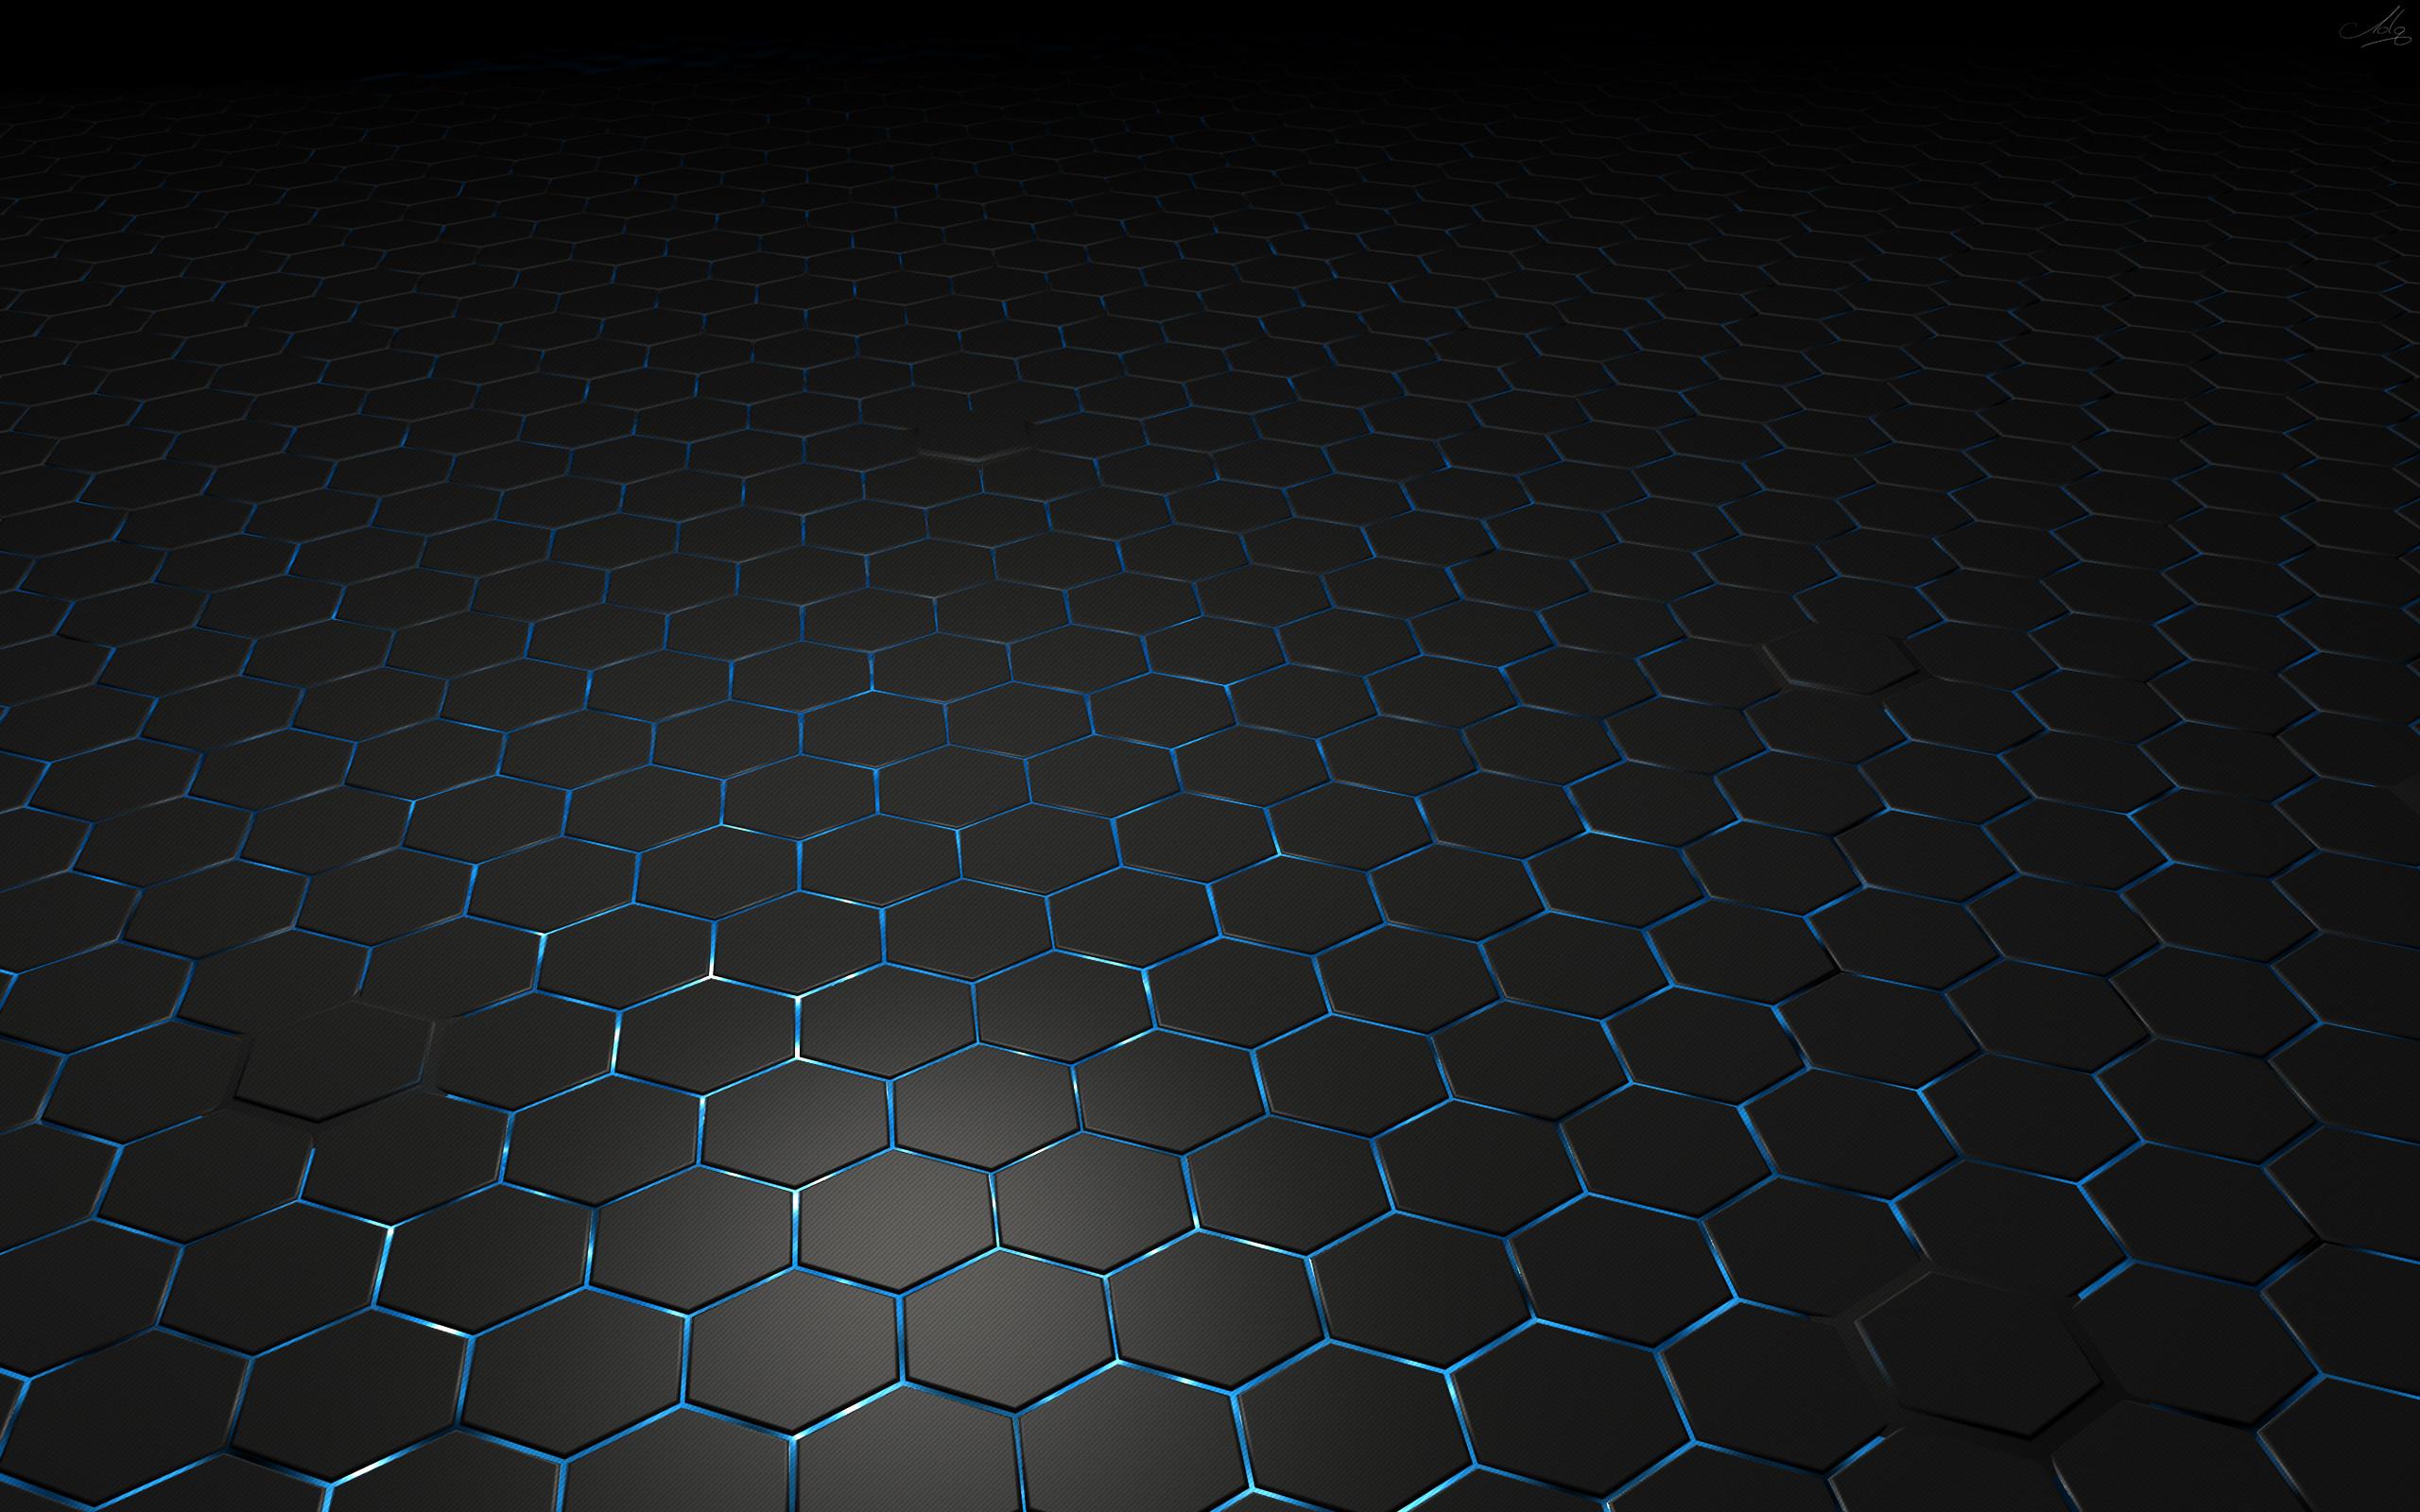 hexagon wallpapers hexagon backgrounds pattern hexagon wallpapers